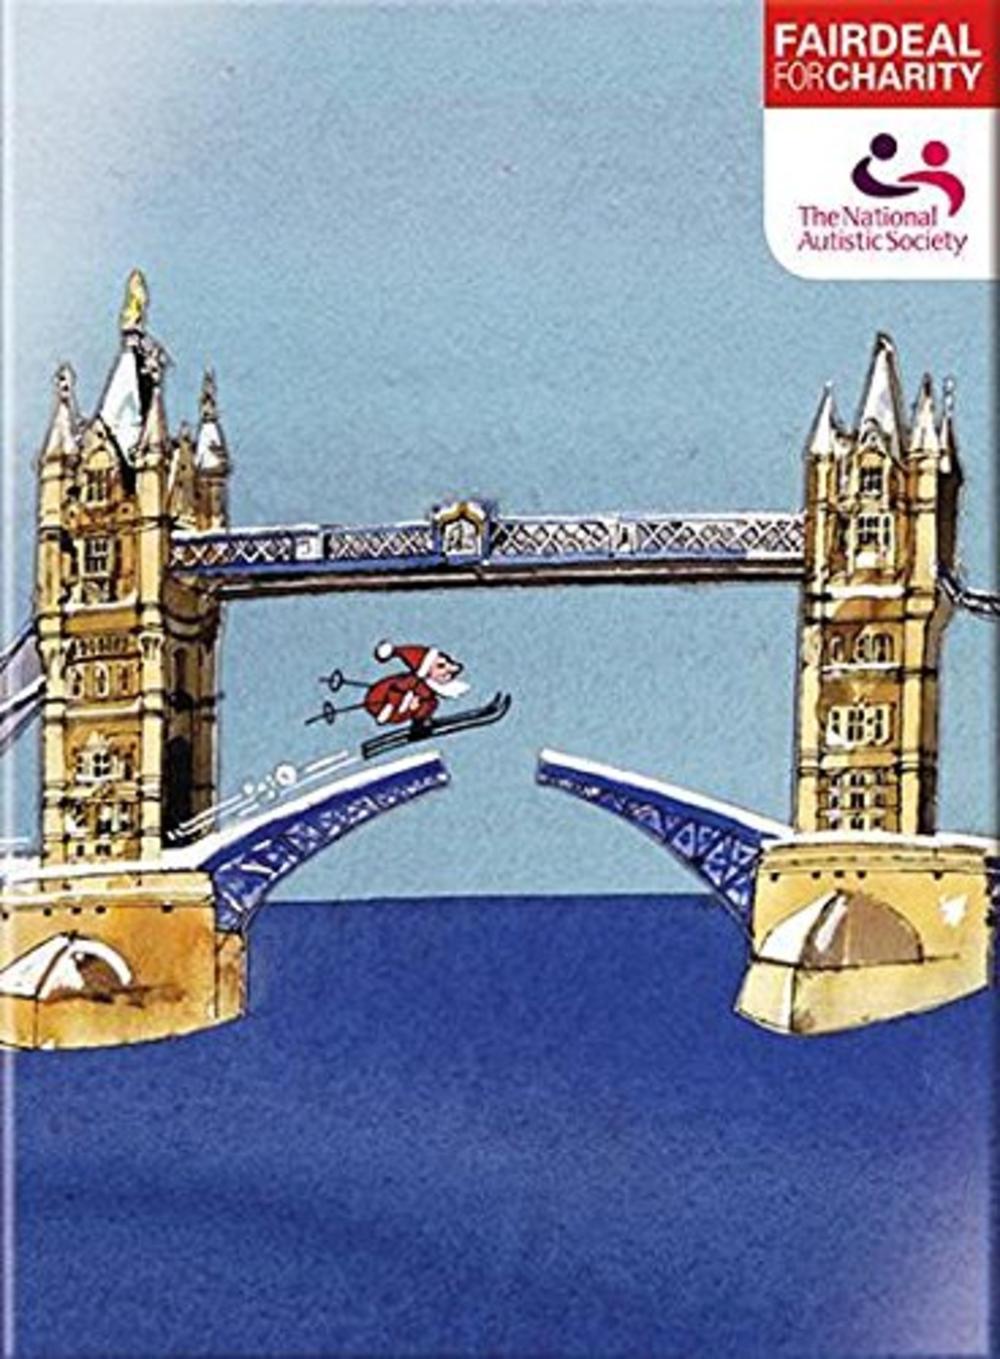 Box of 10  Skiing Santa Autistic Society Charity Christmas Cards